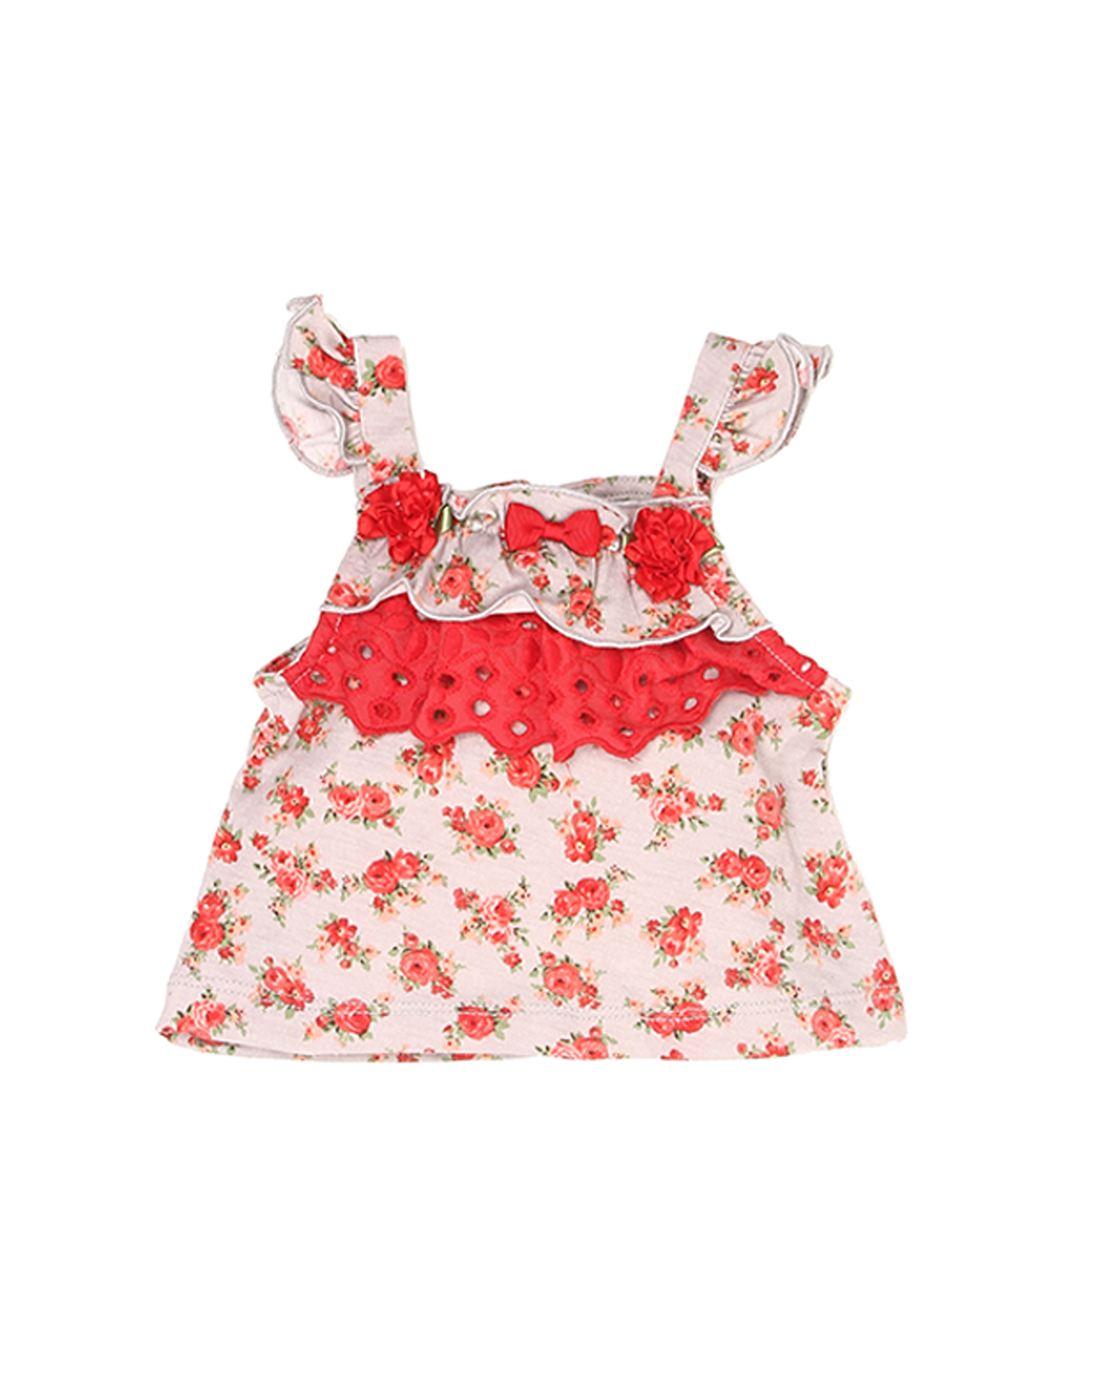 K.C.O 89 Baby Girls Casual Printed Cap Sleeve Top